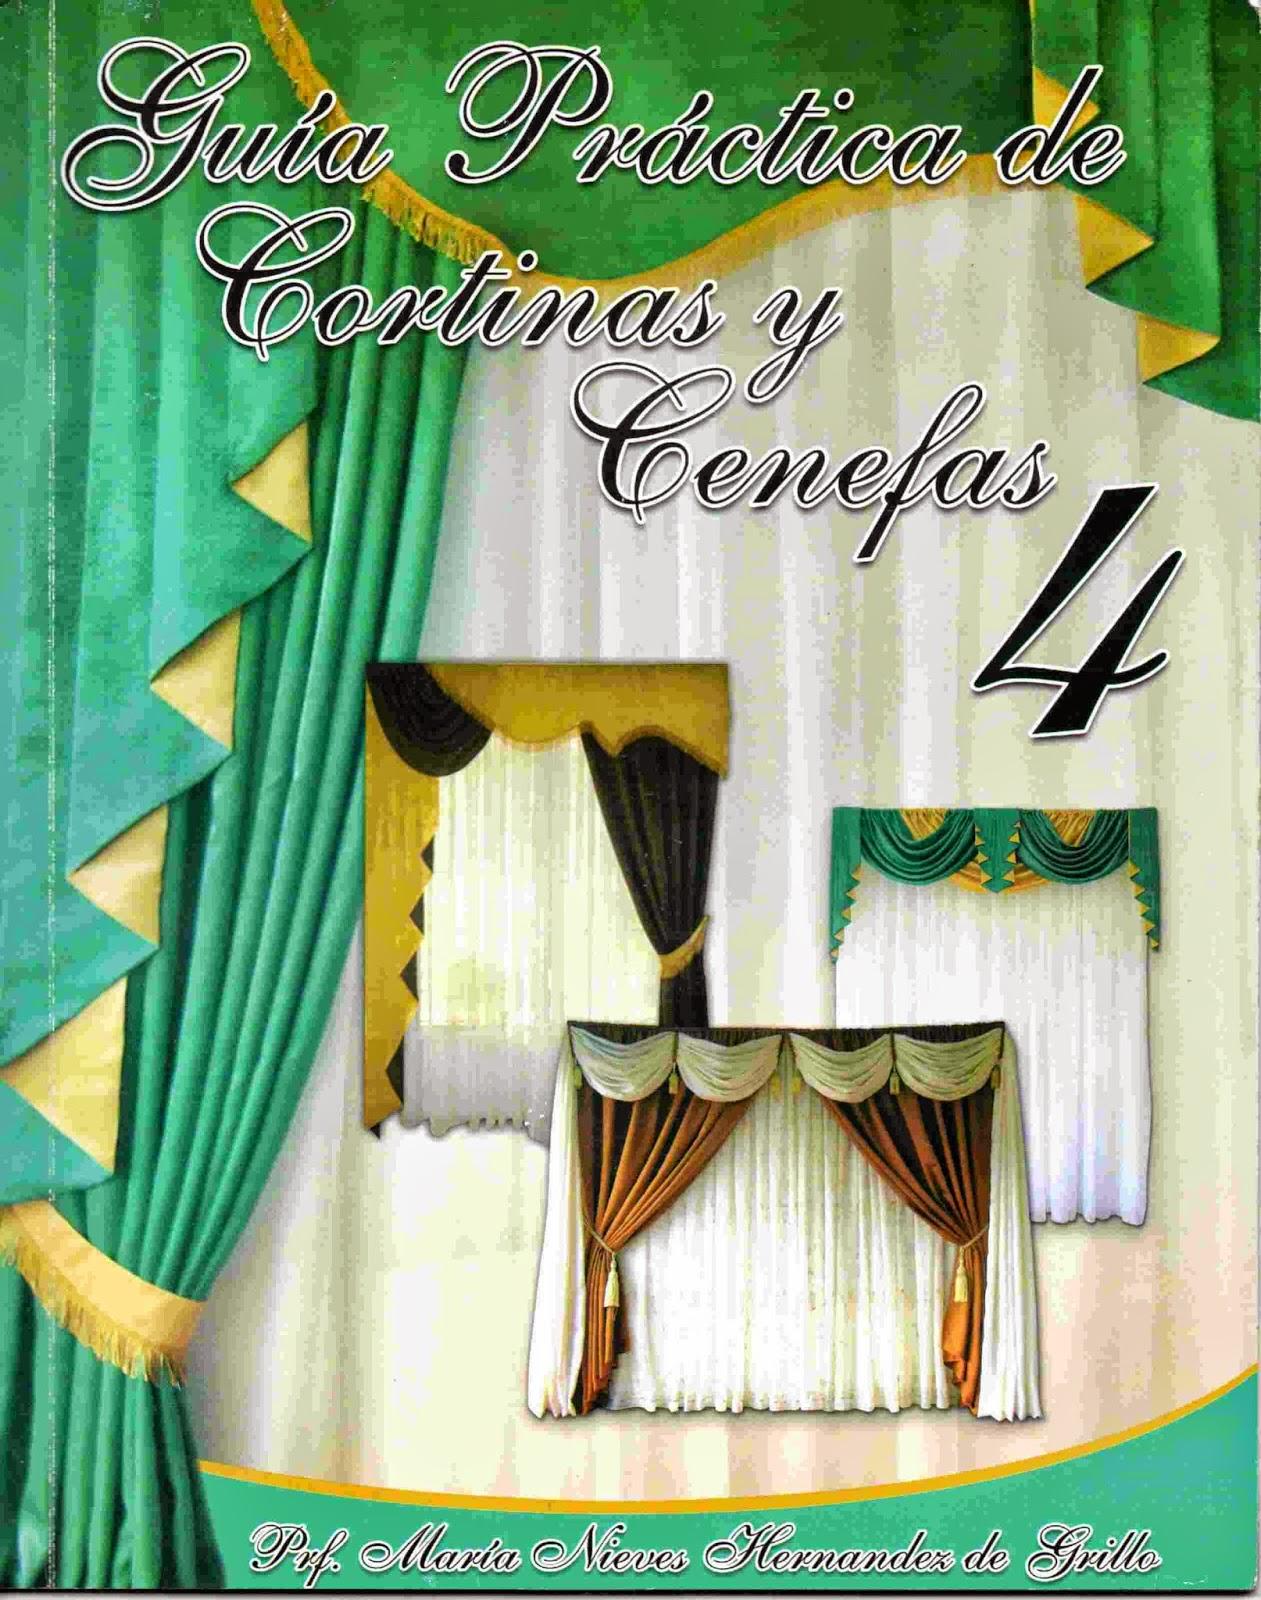 Libros de costura como hacer cortinas paso a paso for Modelos de cenefas para cortinas